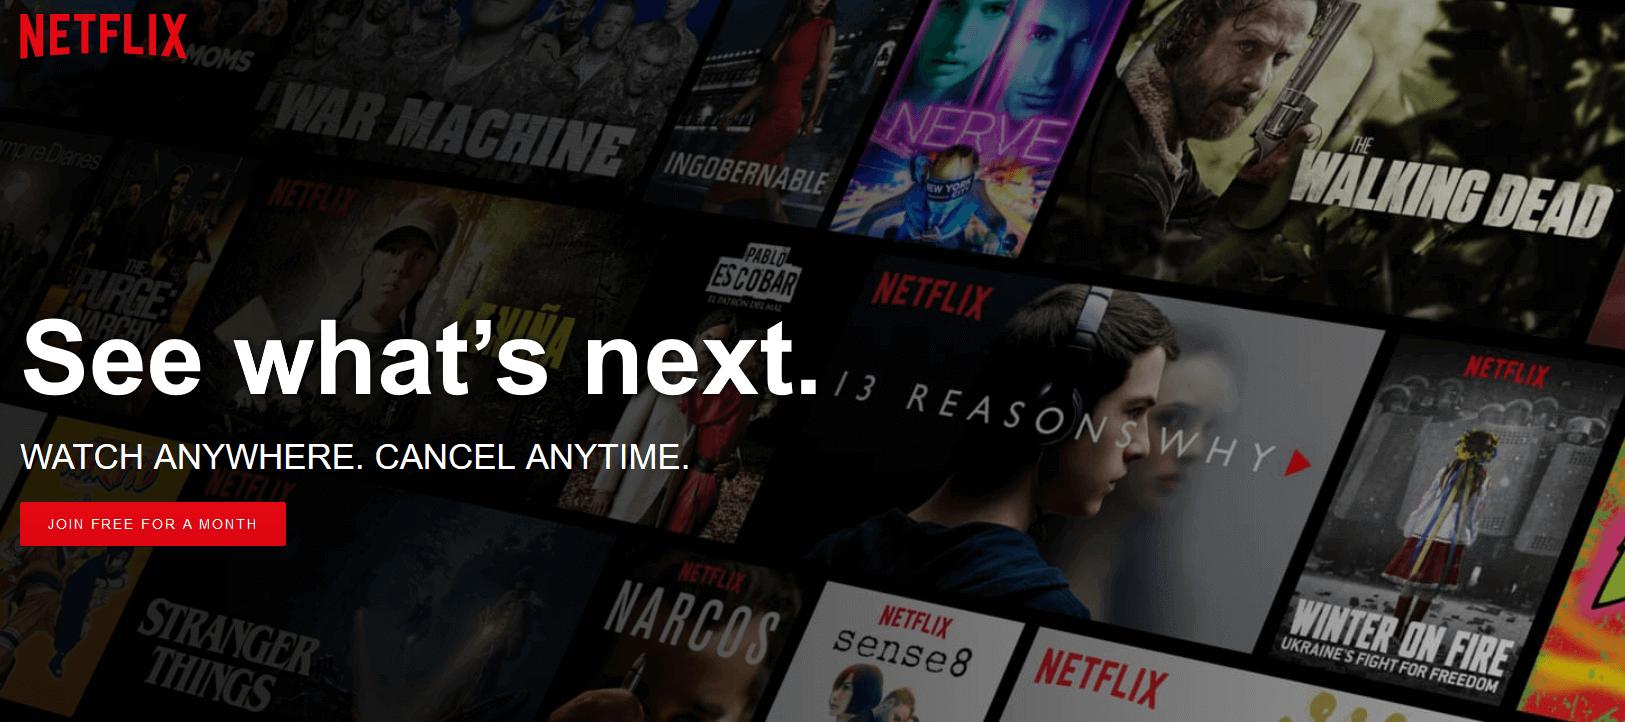 Netflix's homepage.